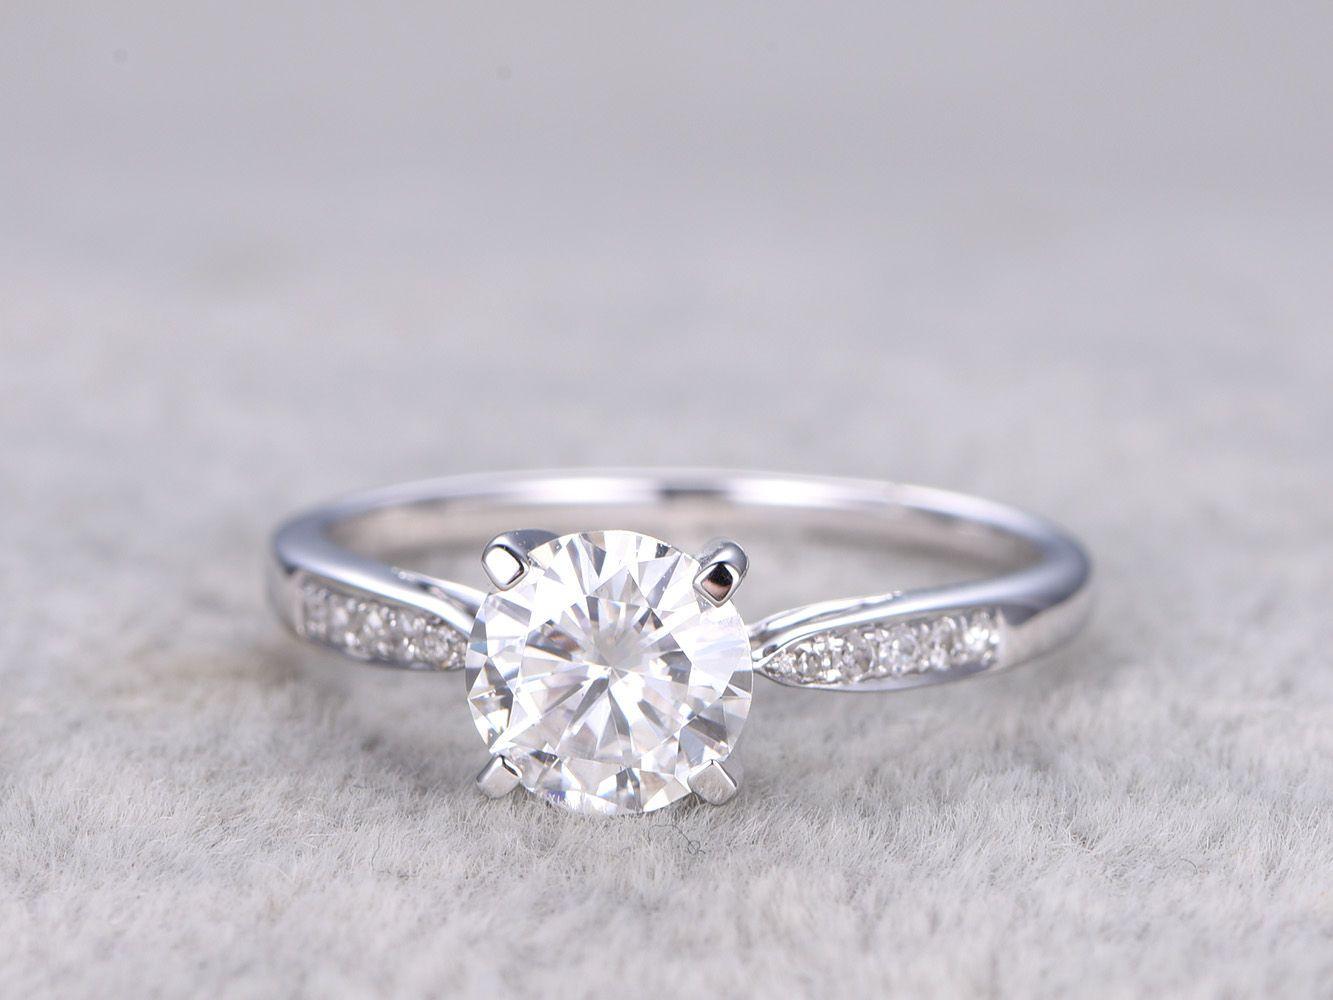 Brilliant moissanite engagement ring white golddiamond wedding band